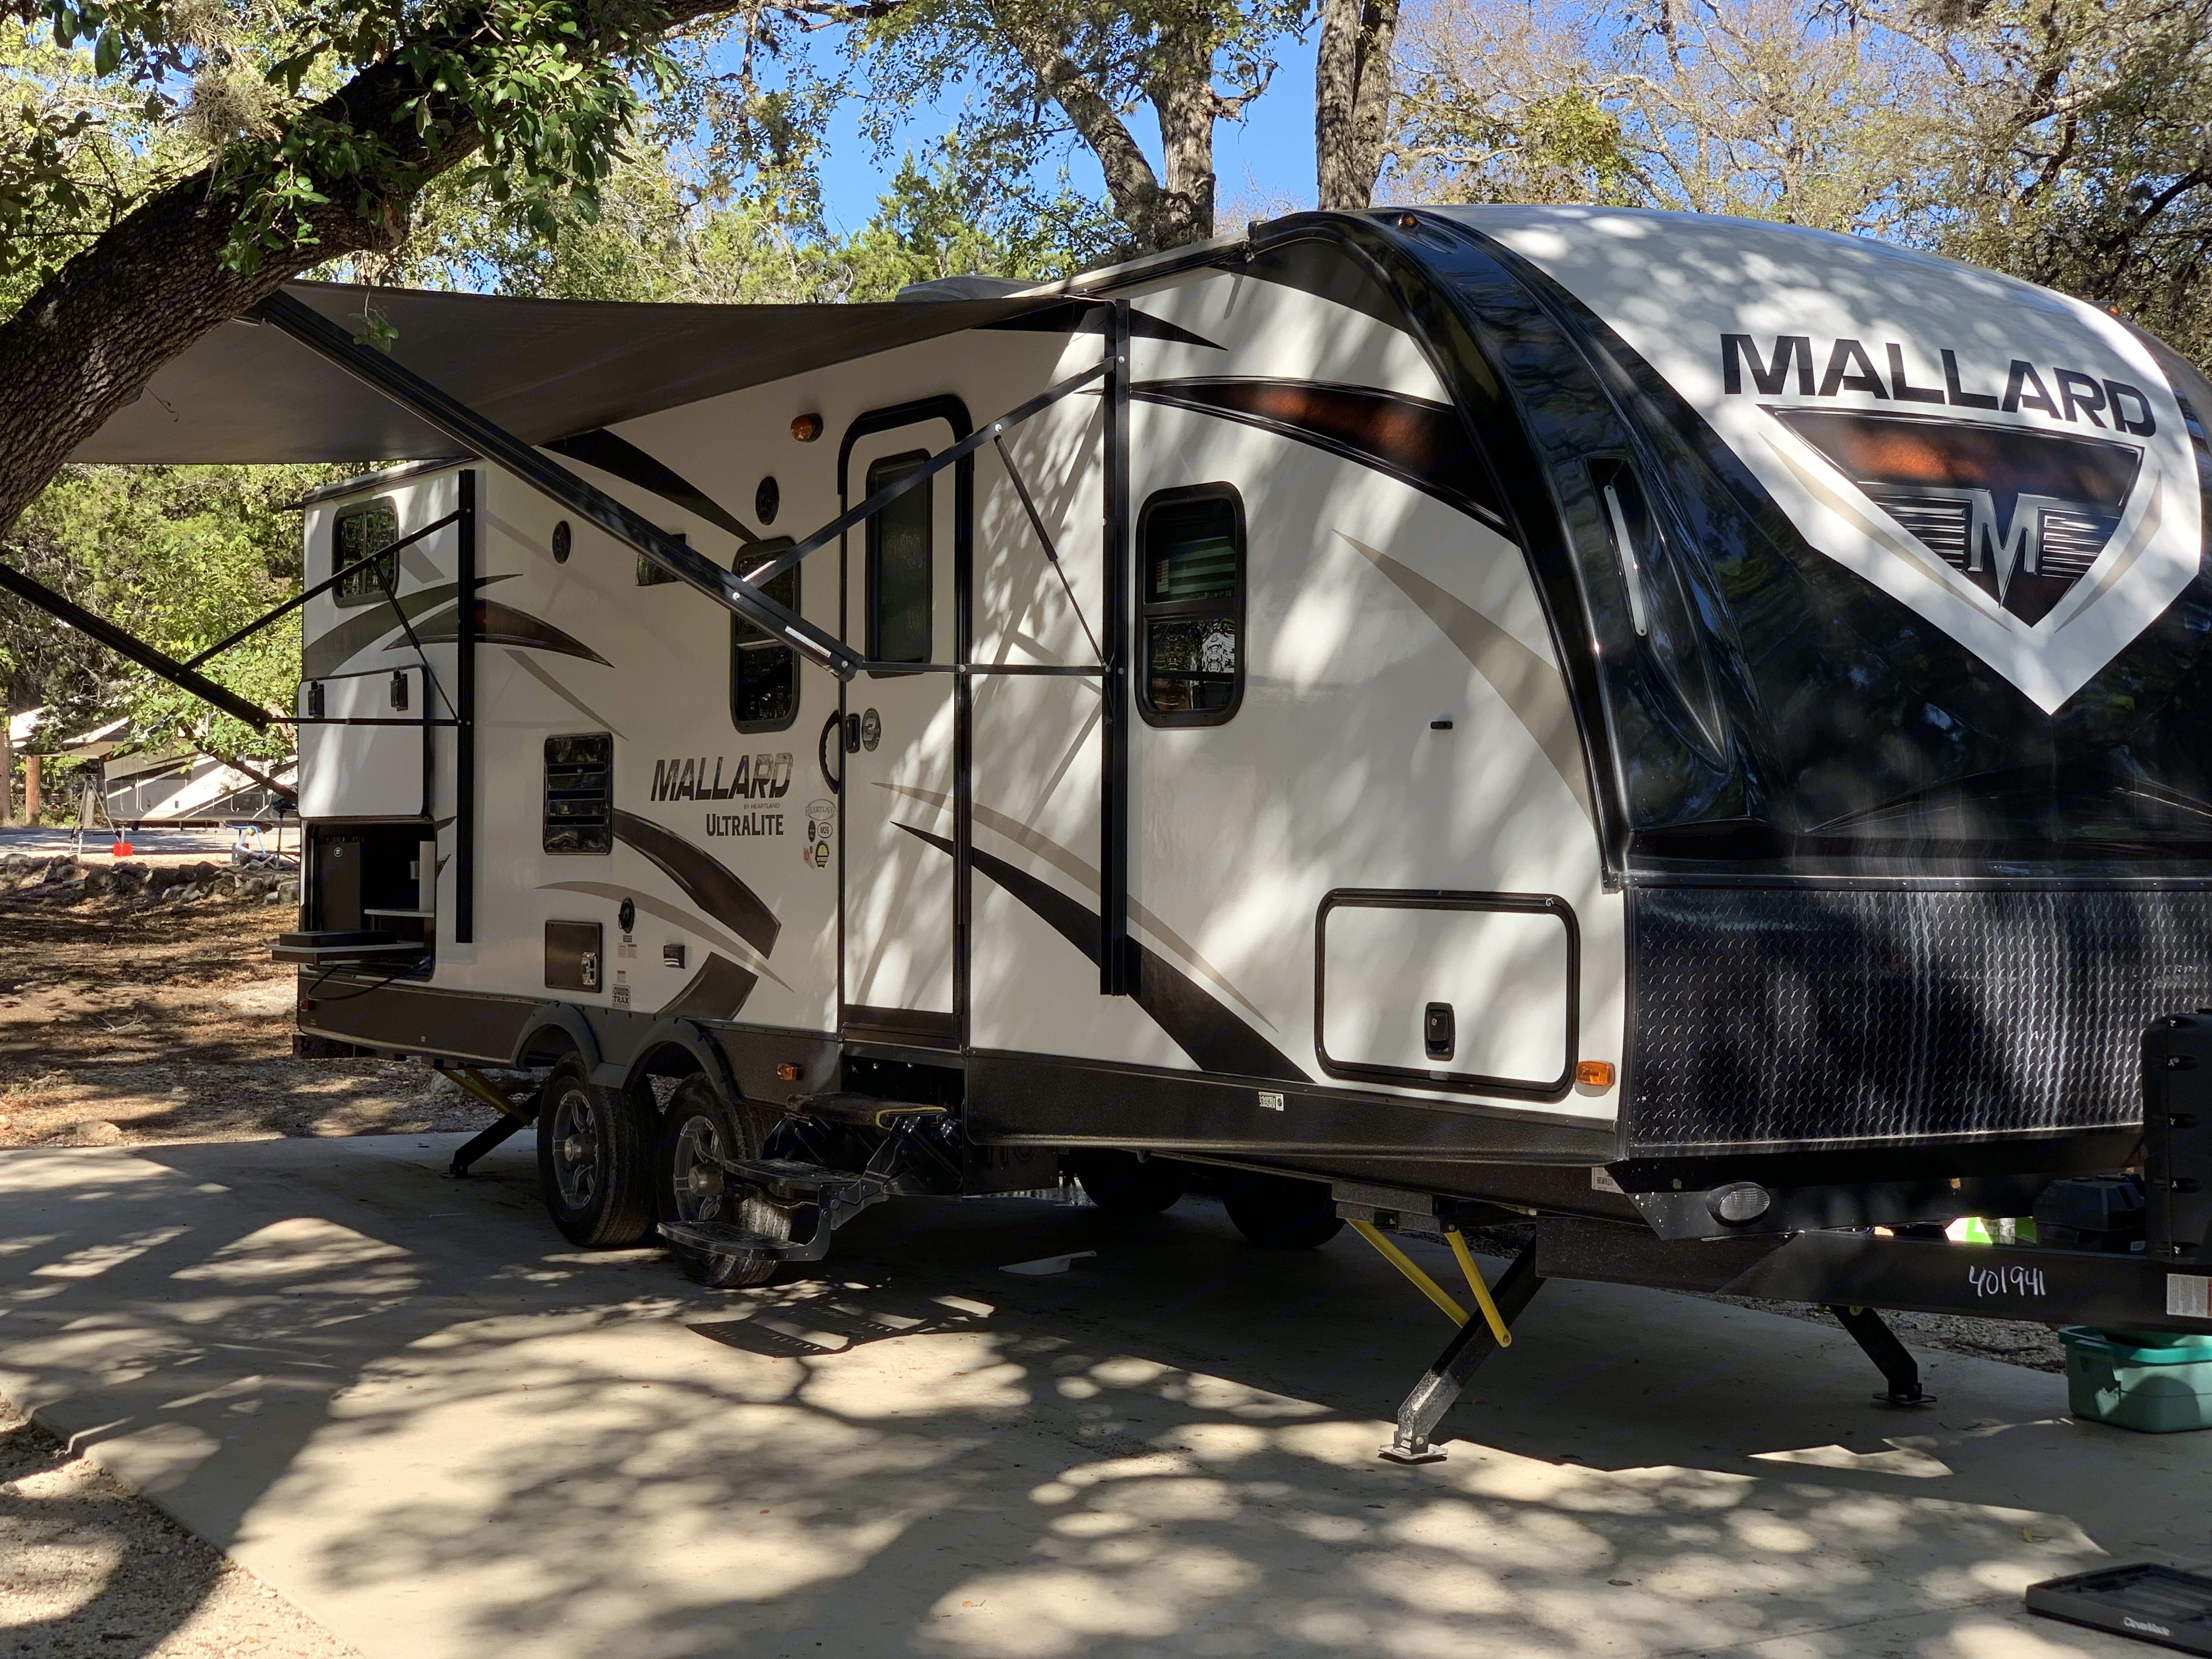 Covered awning. Heartland Mallard 2018